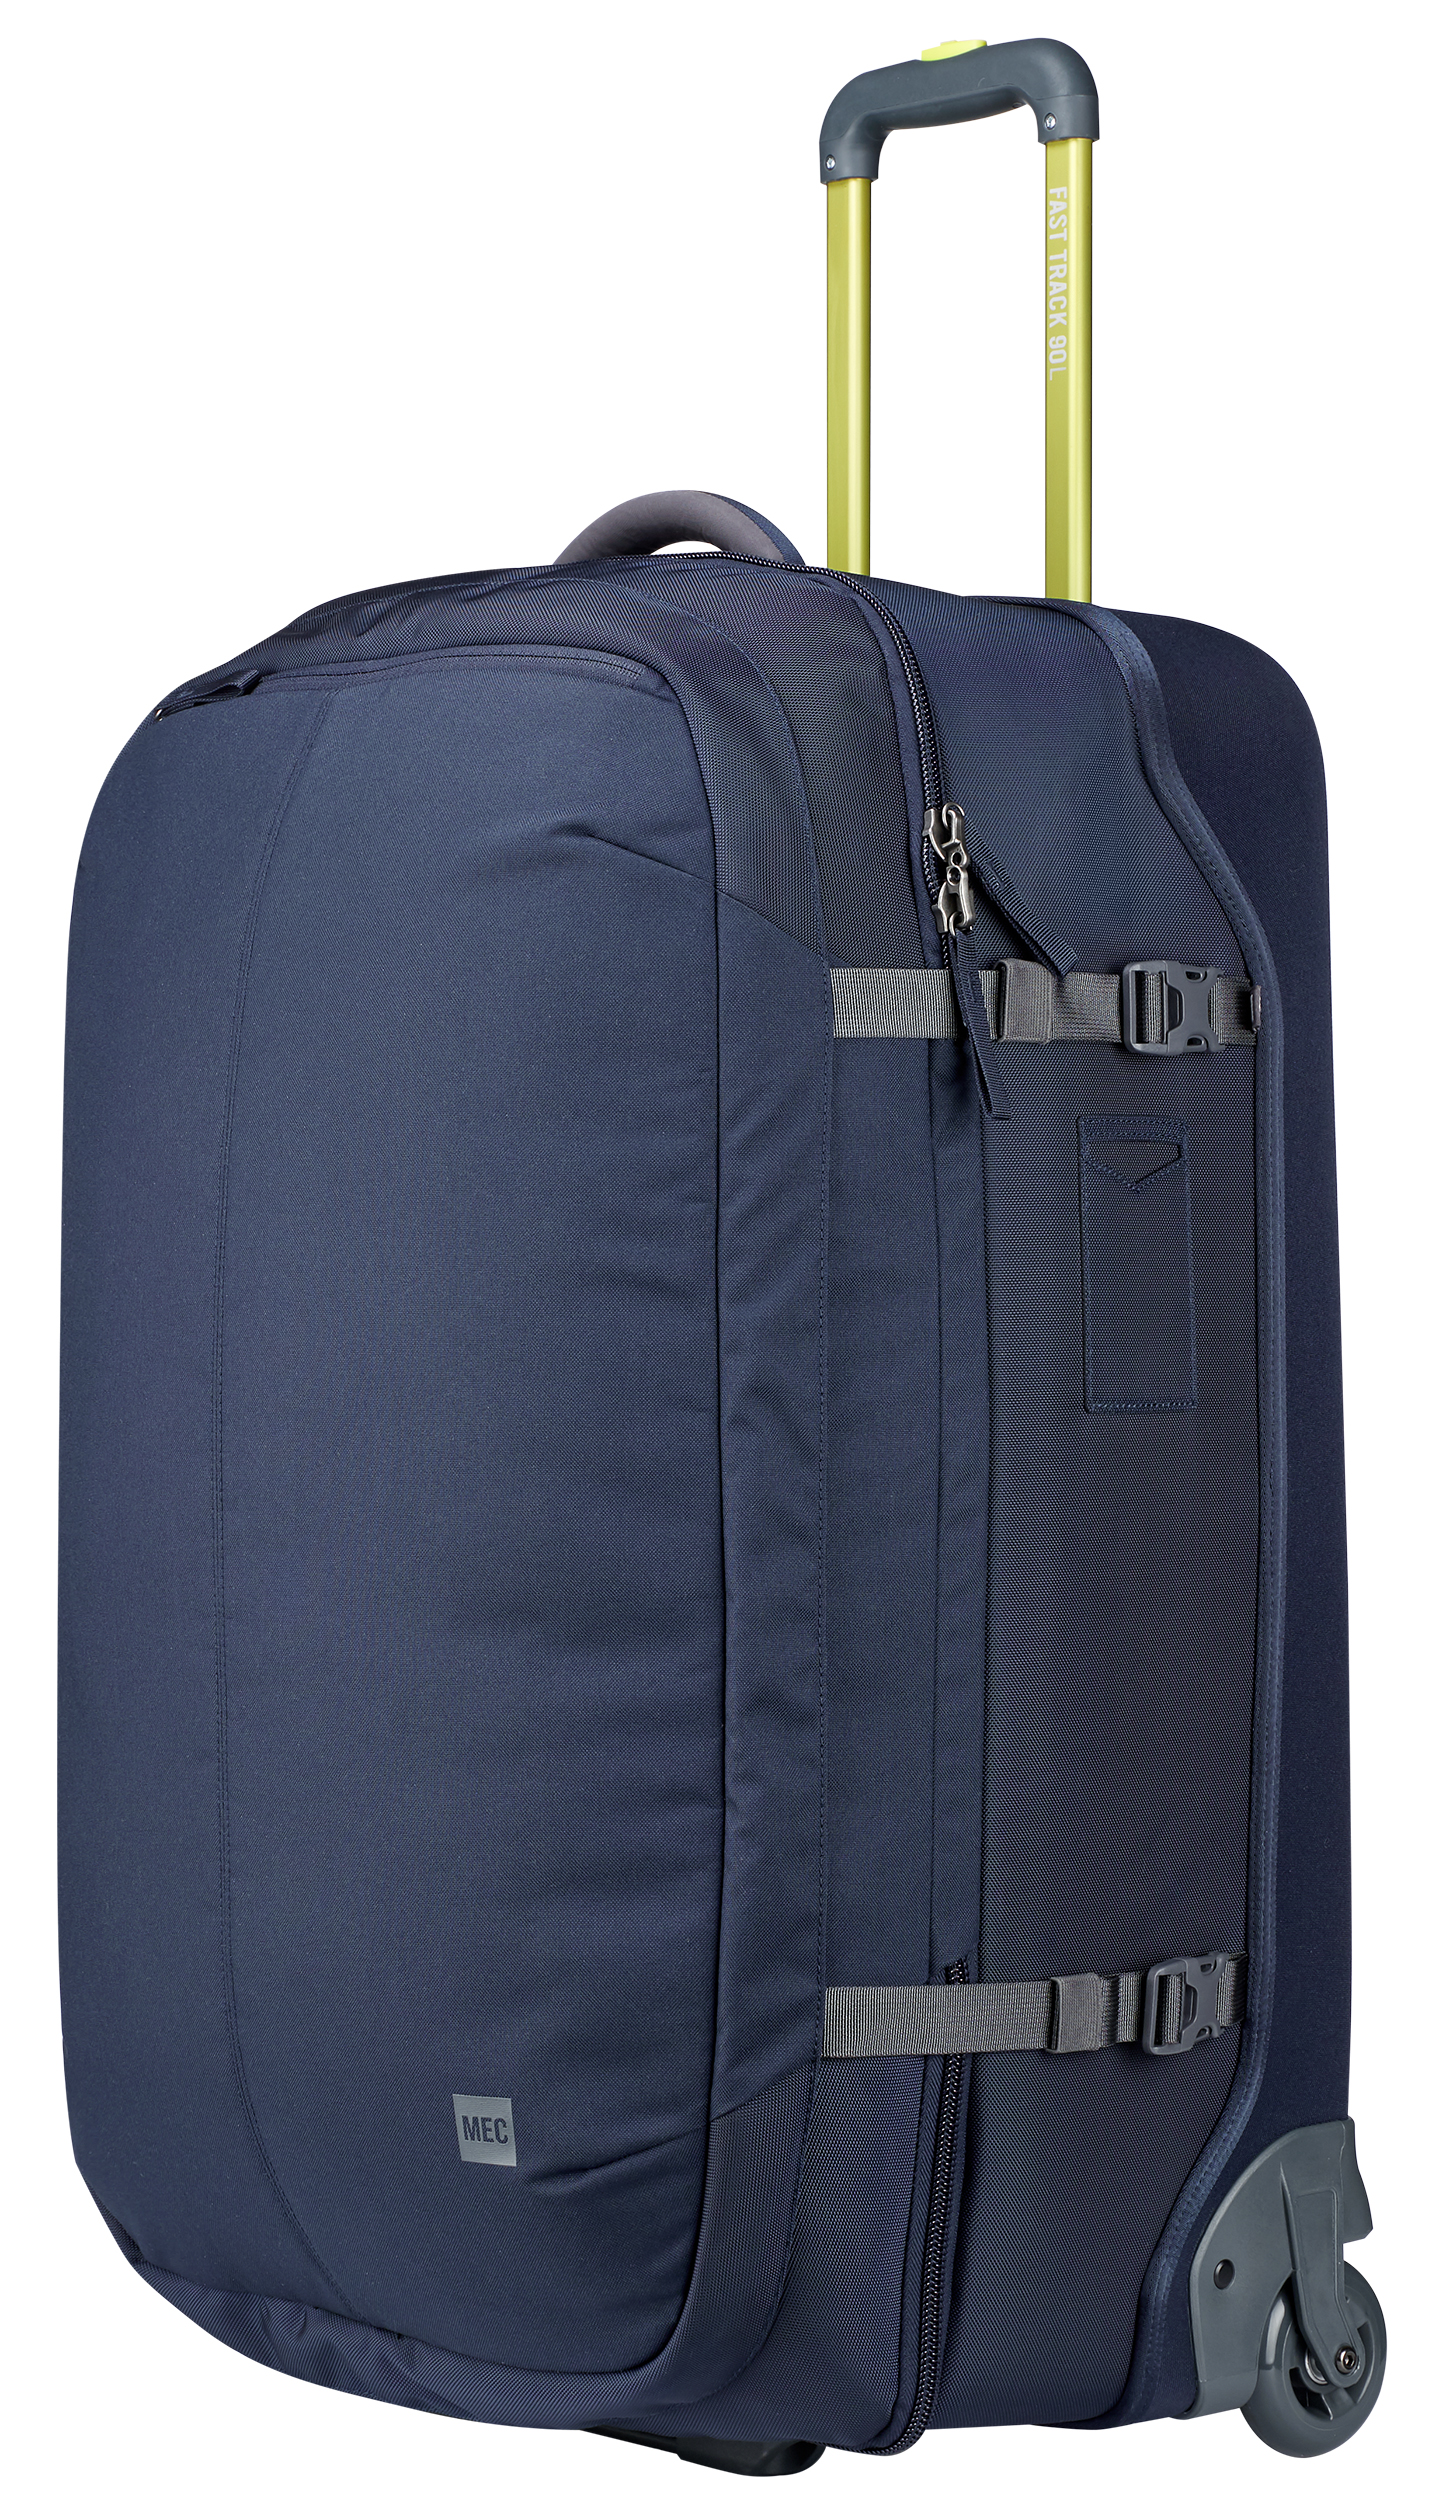 a5a976e871 Rolling bags